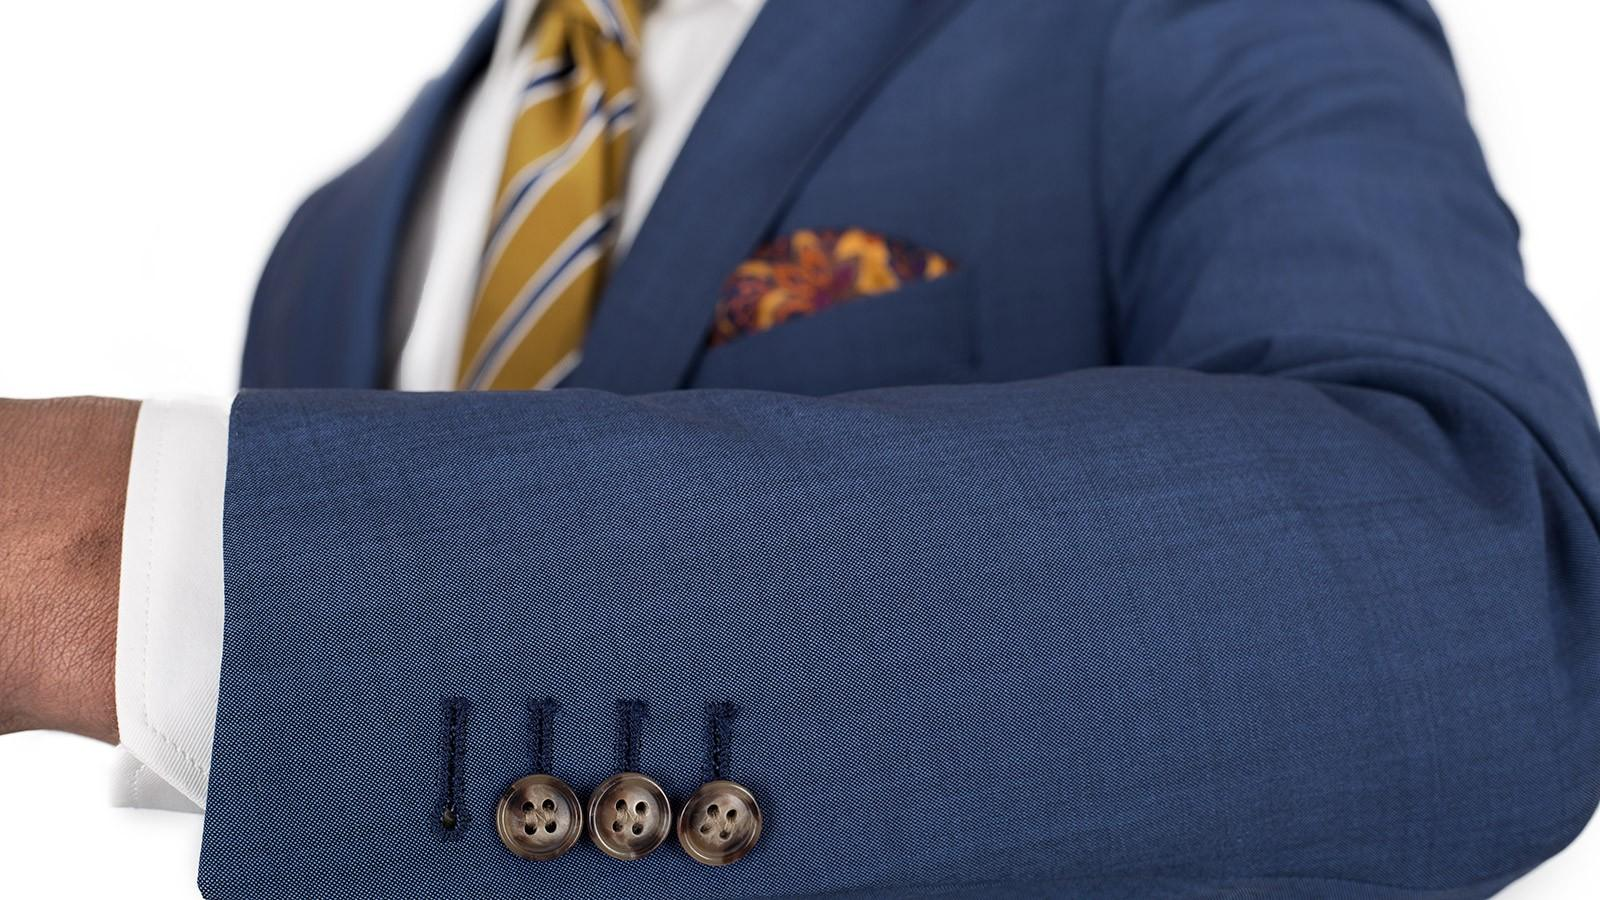 Sky Blue Wool & Mohair Suit - slider image 1